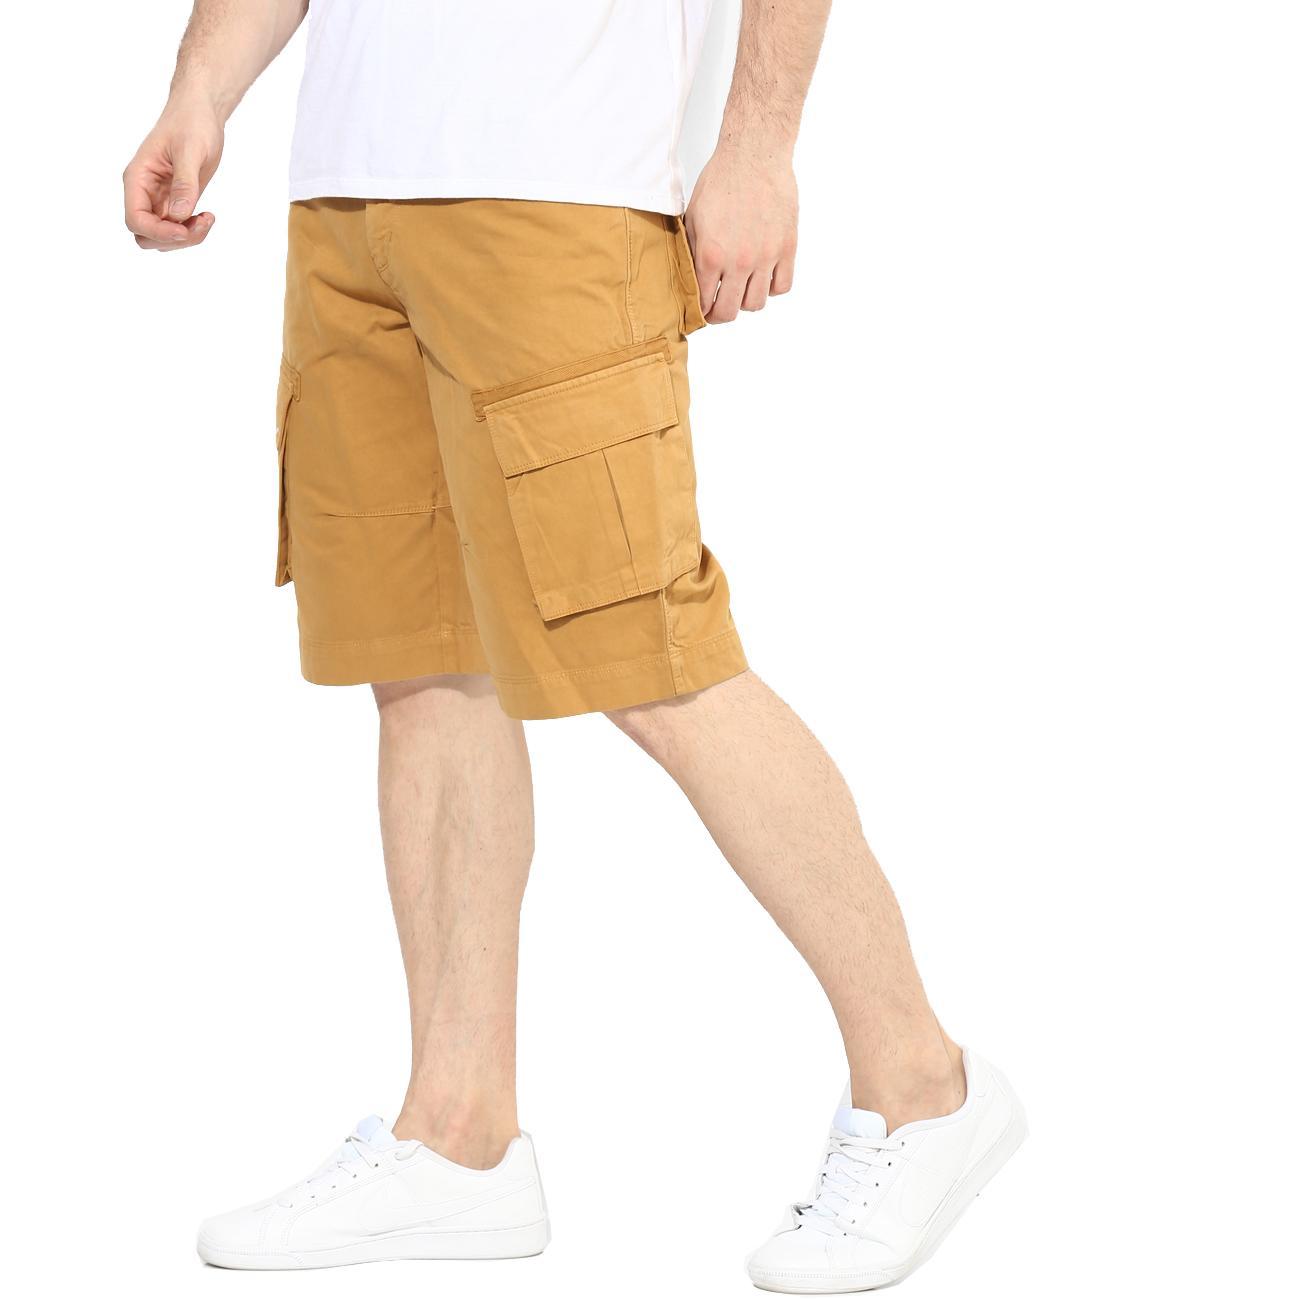 Red Chief Beige Shorts for Men Online